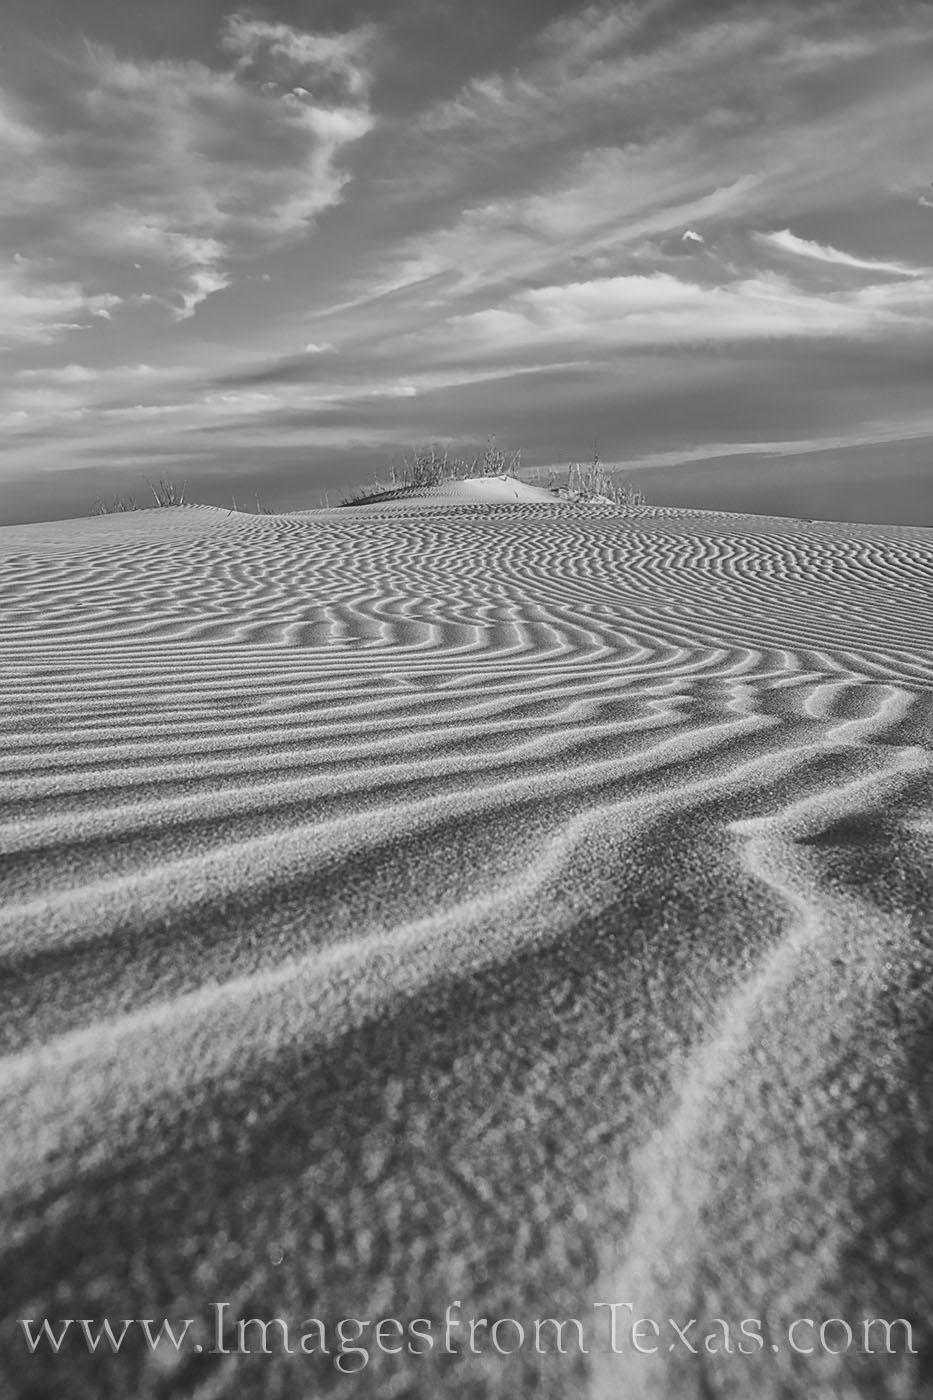 monahans, sandhills, sandhills state park, sand dunes, texas dunes, sand, texture, west texas, monahans sandhills state park, state parks, texas state parks, texas parks, black and white, photo